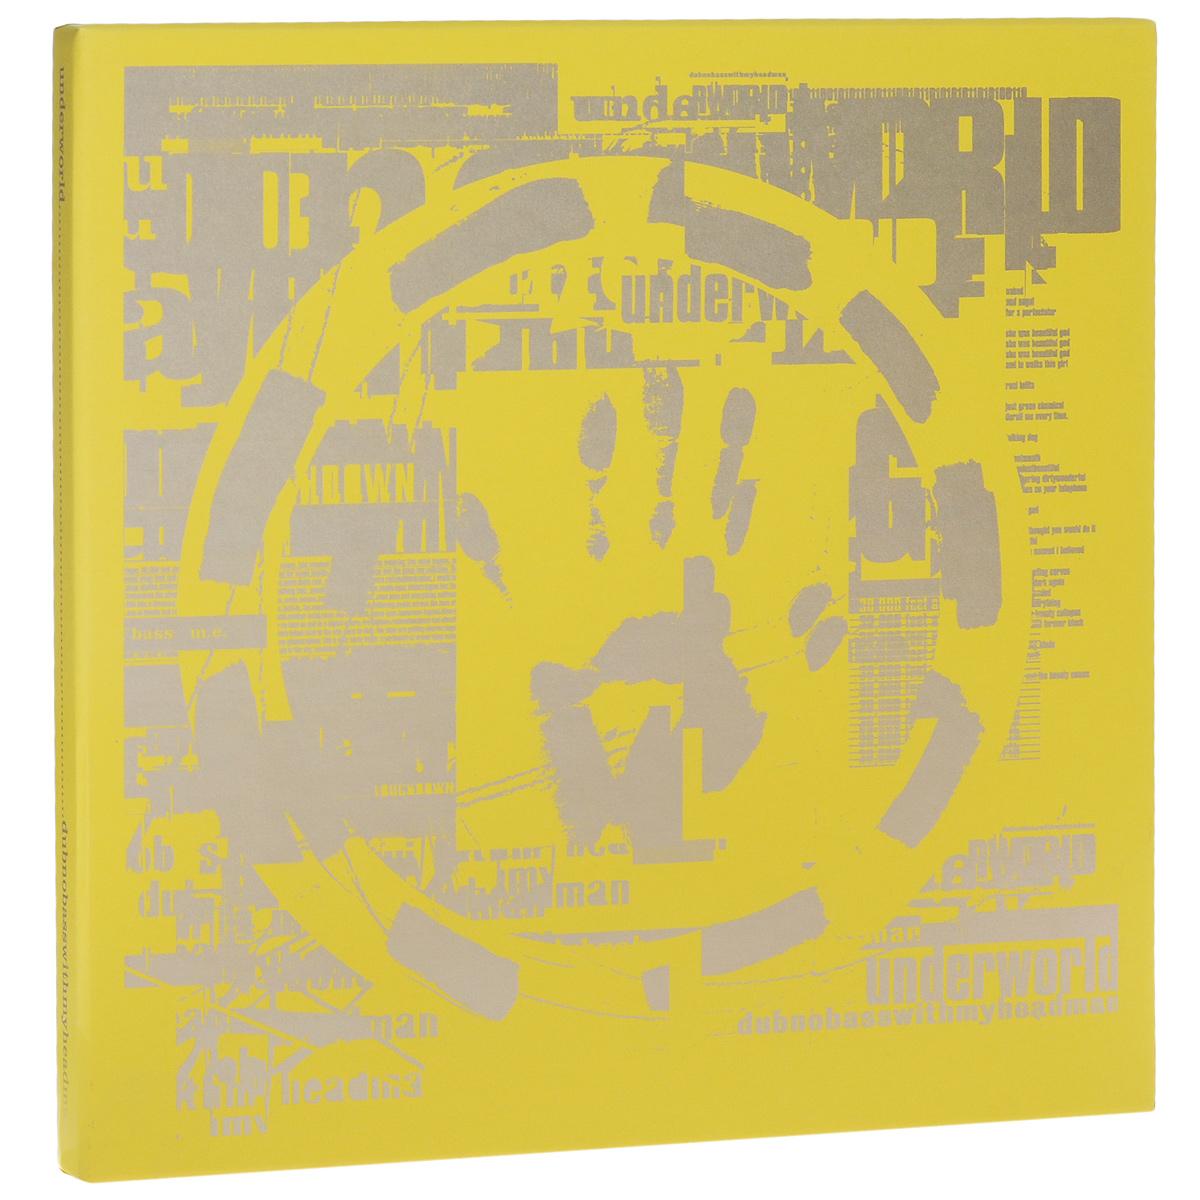 Underworld. Dubnobasswithmyheadman (5 CD) 2014 5 Audio CD